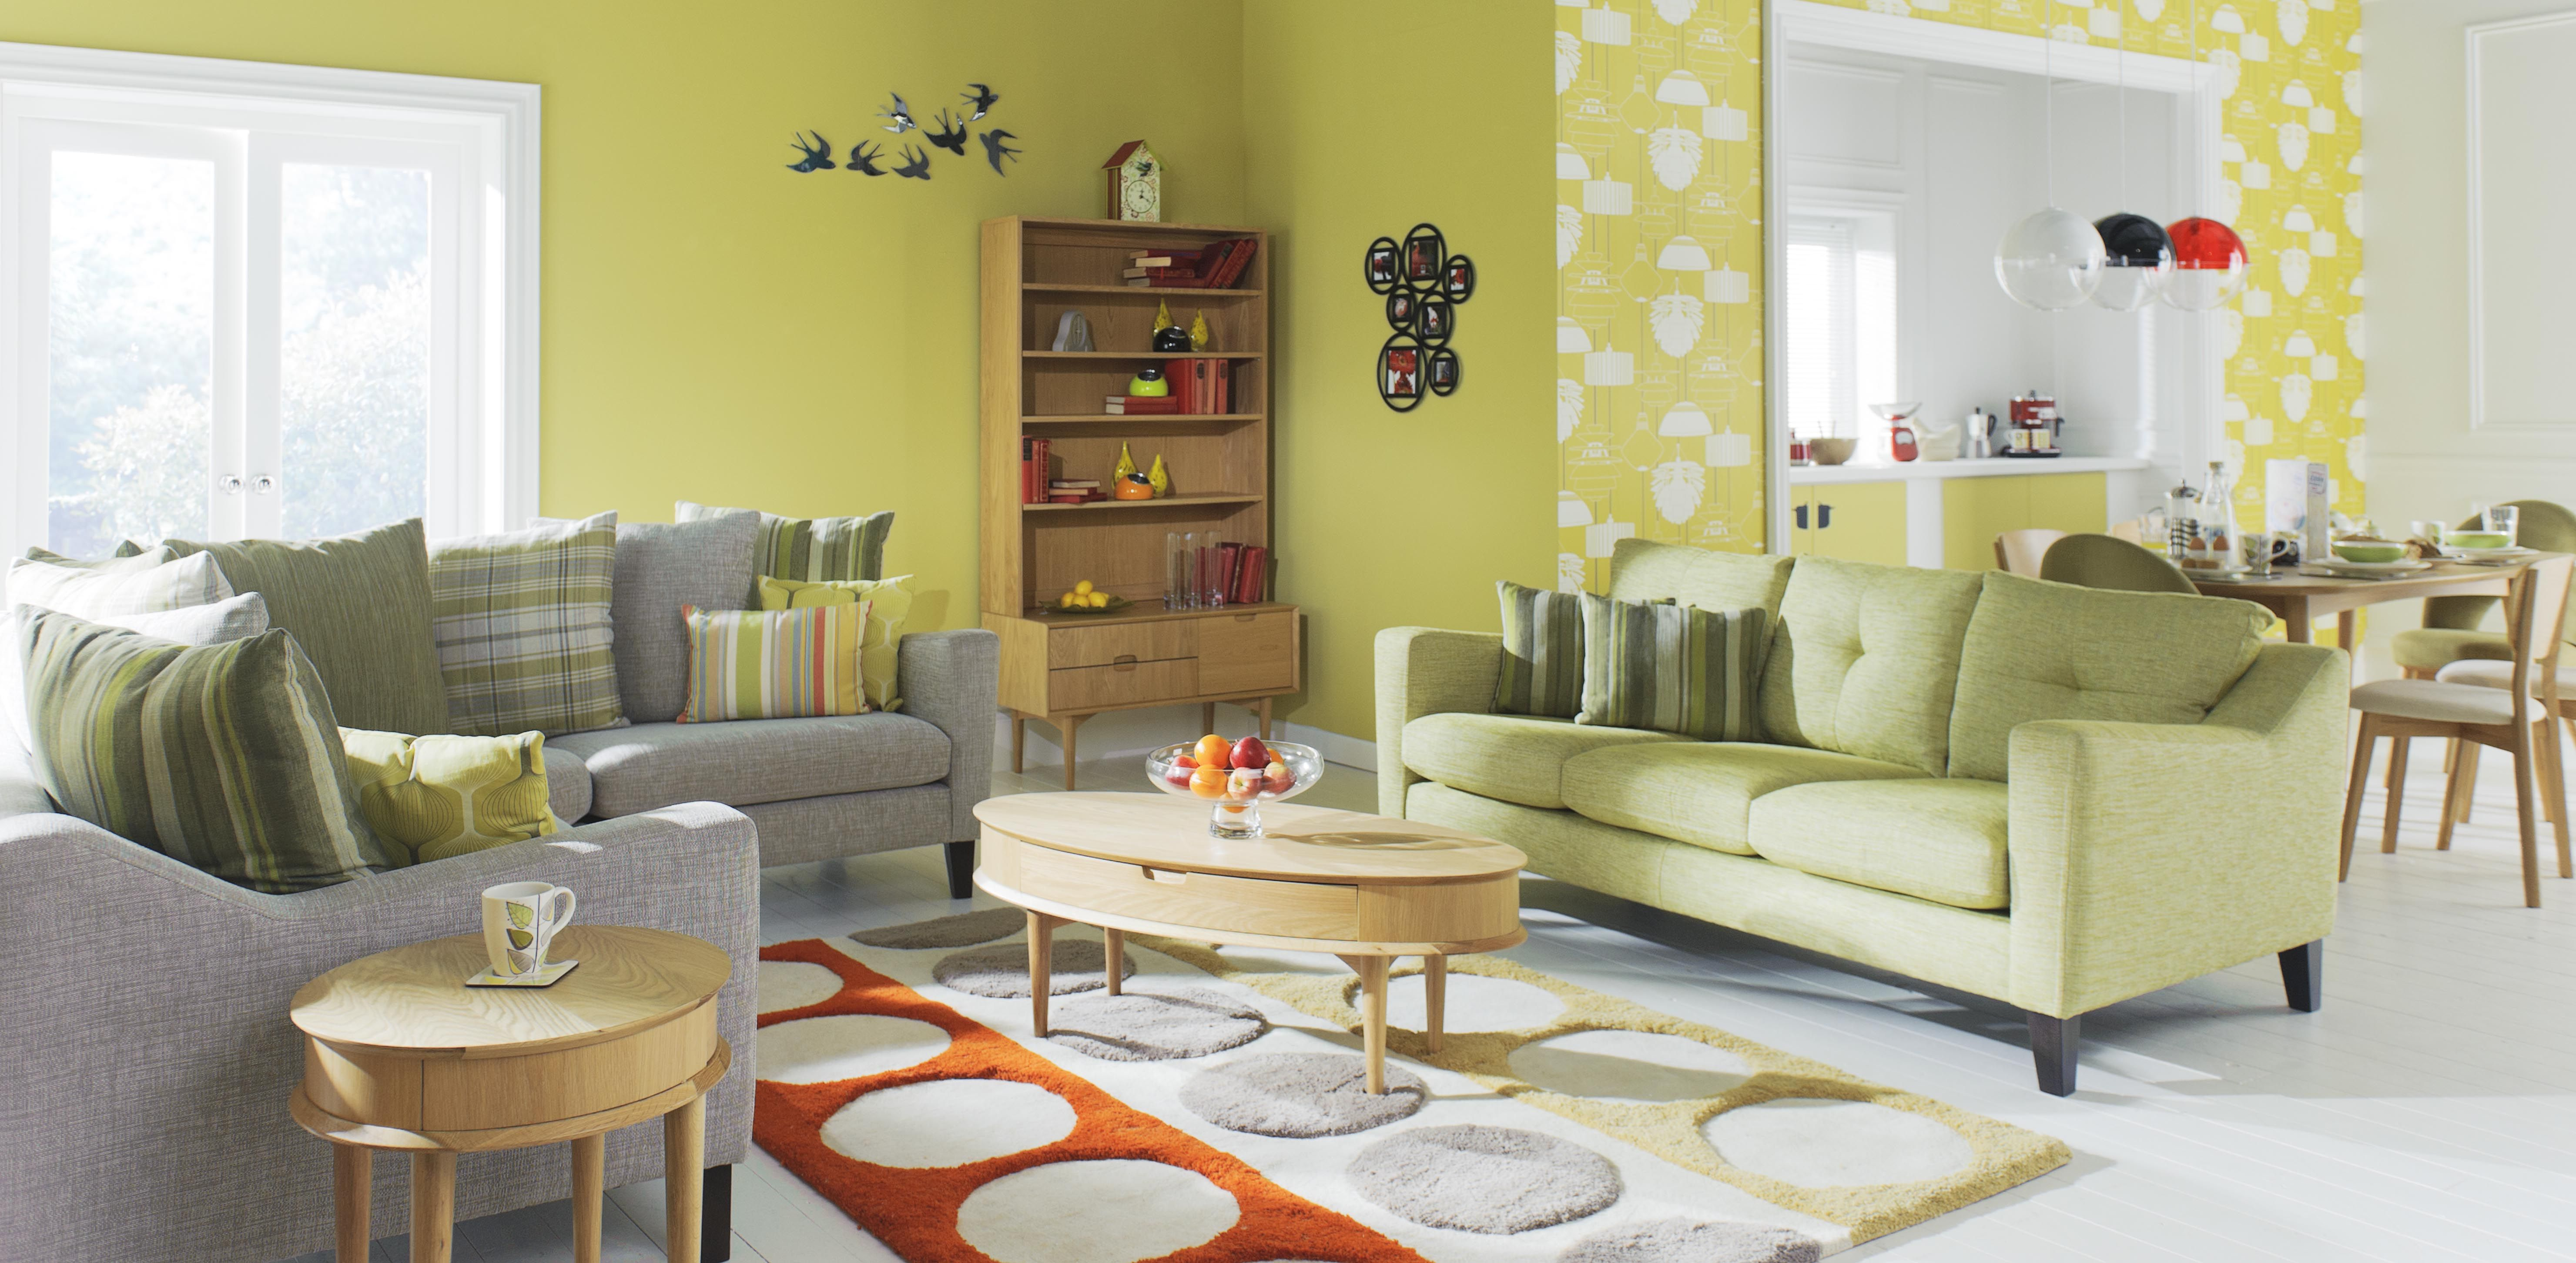 50s living room - google search | living room ideas | pinterest ...